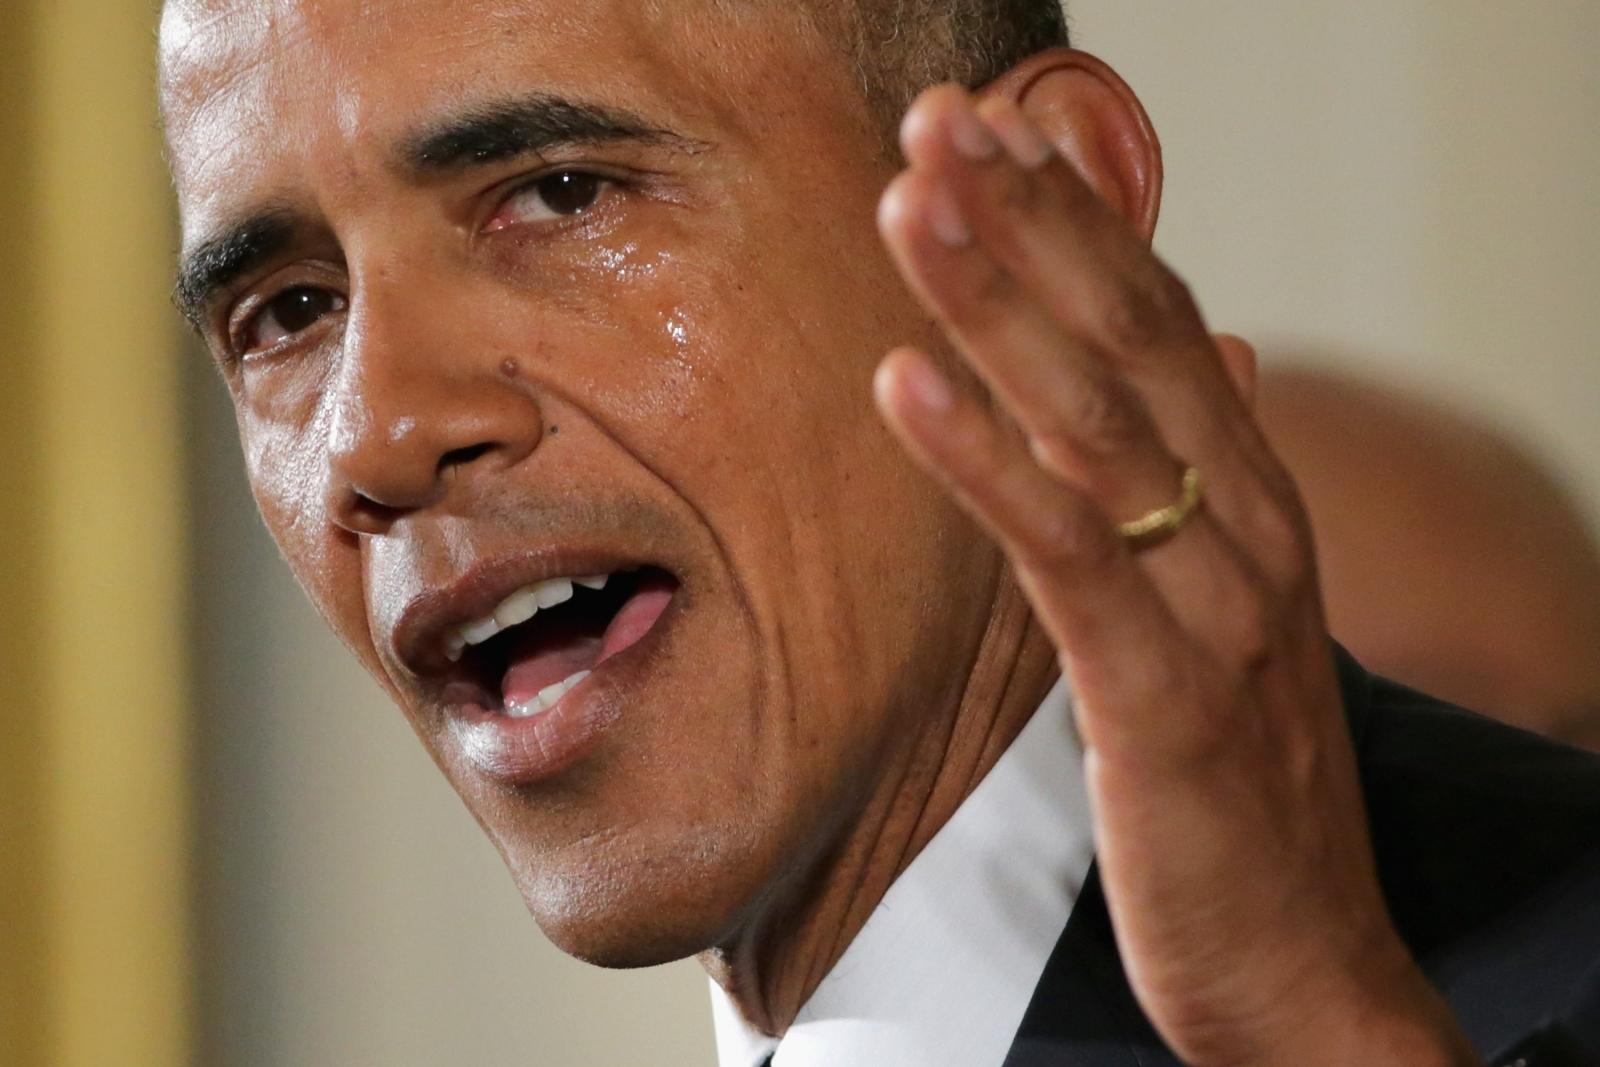 Tearful Barack Obama